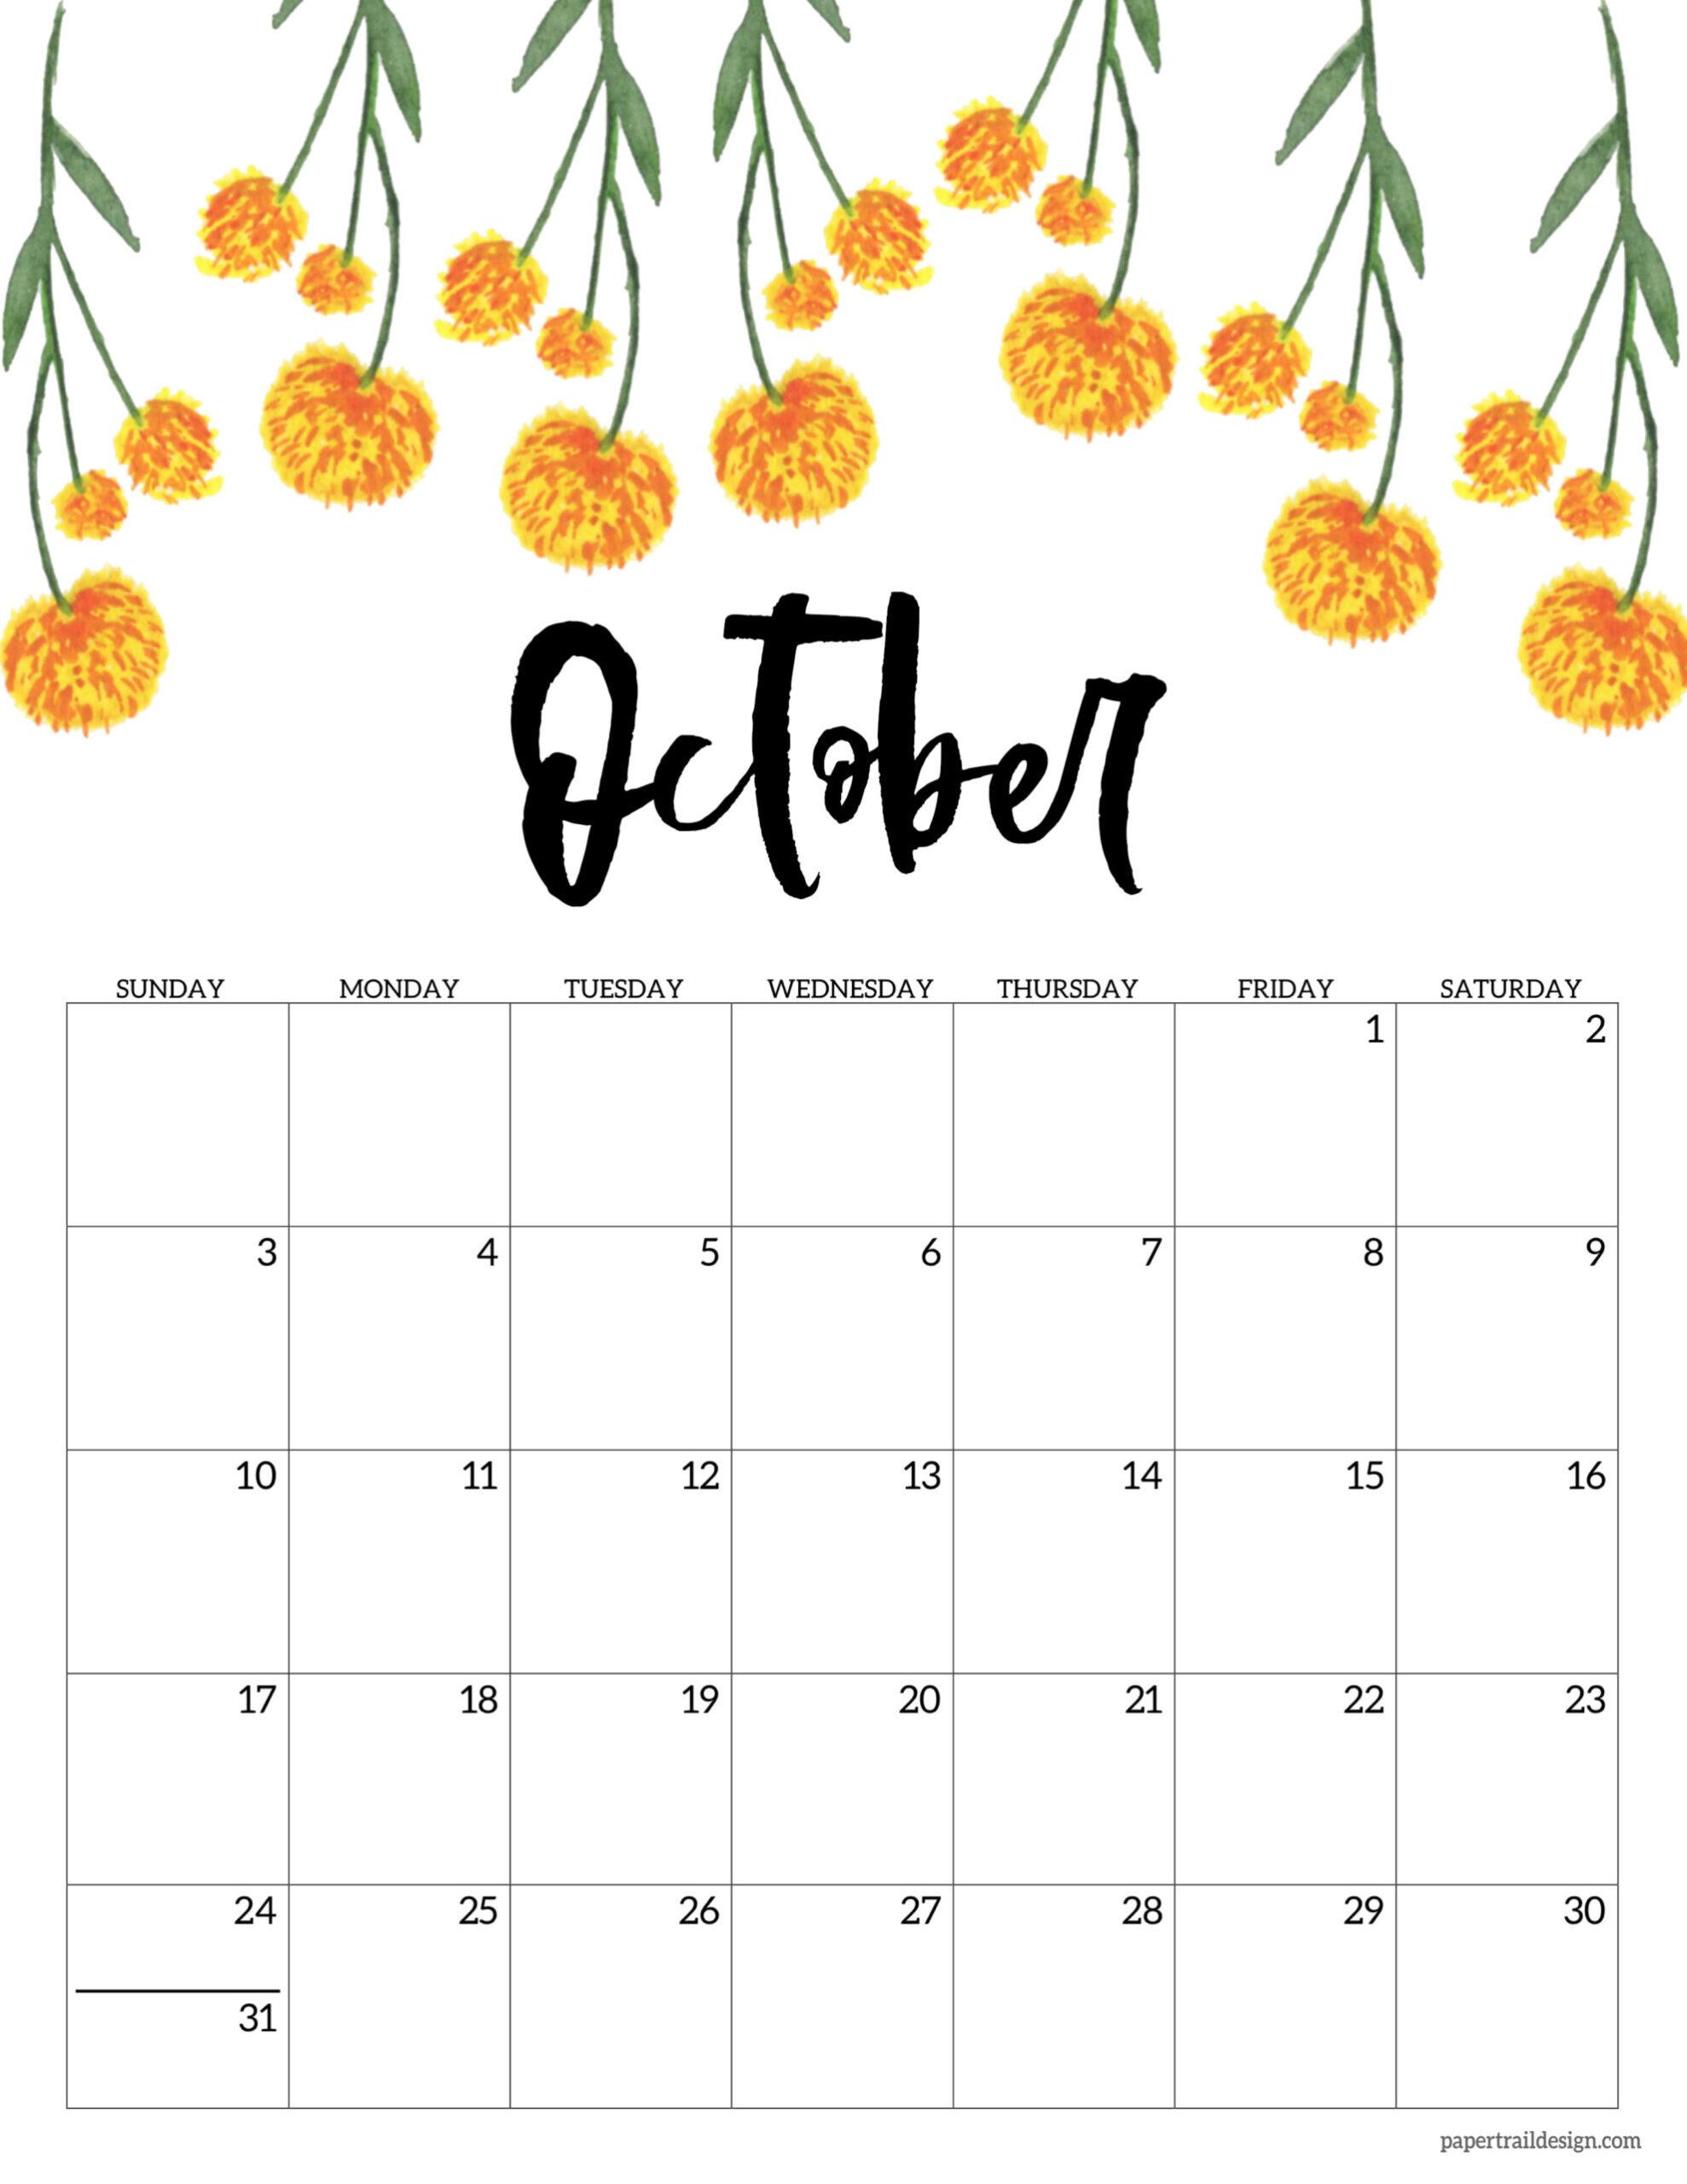 Free Printable 2021 Floral Calendar | Paper Trail Design